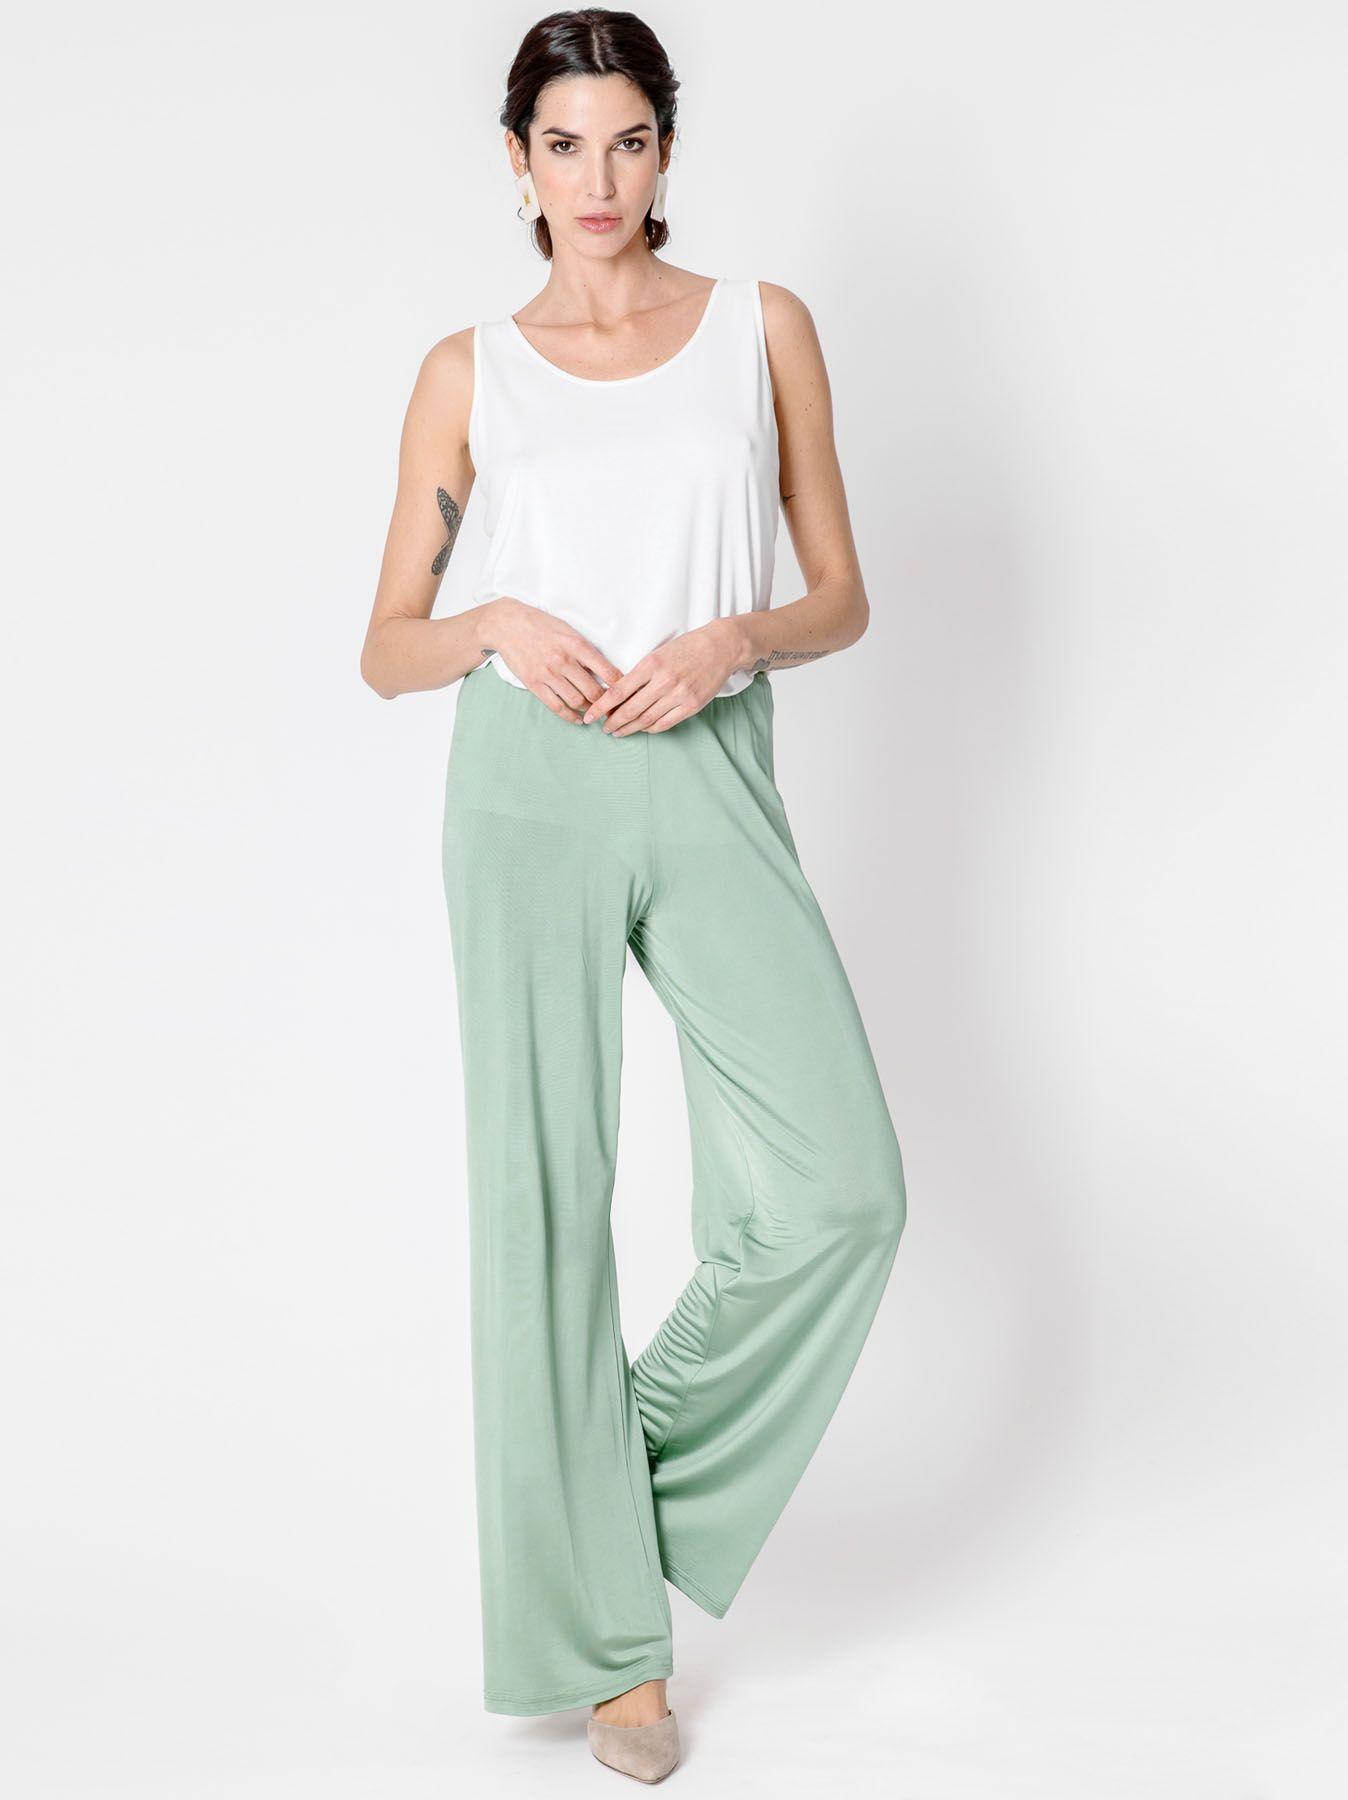 Pantalone elastico lucido